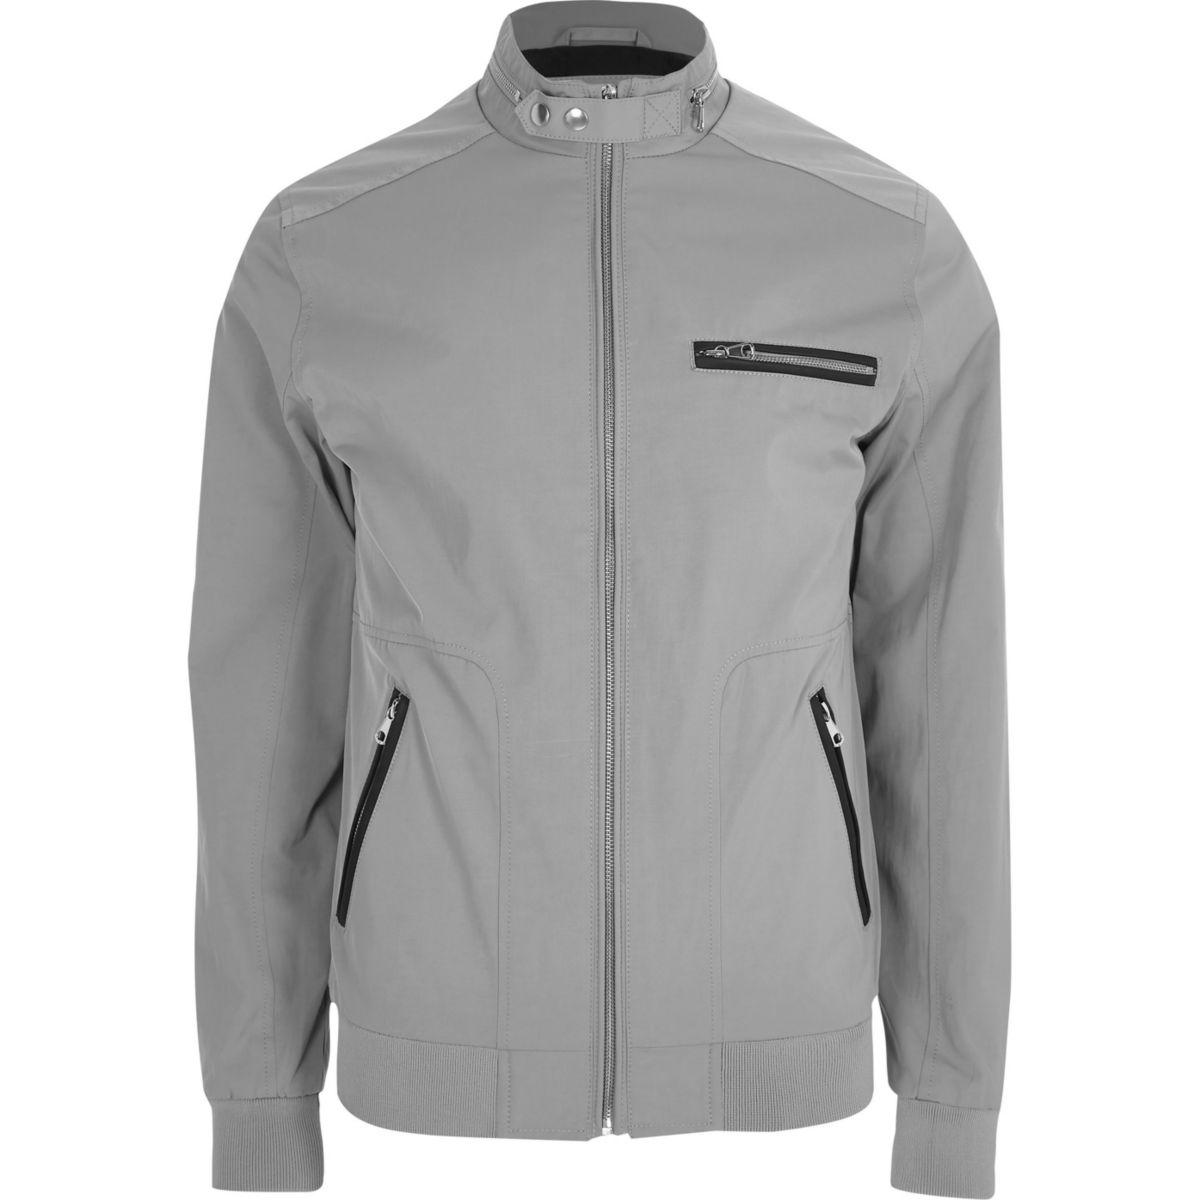 Grey racer neck lightweight jacket